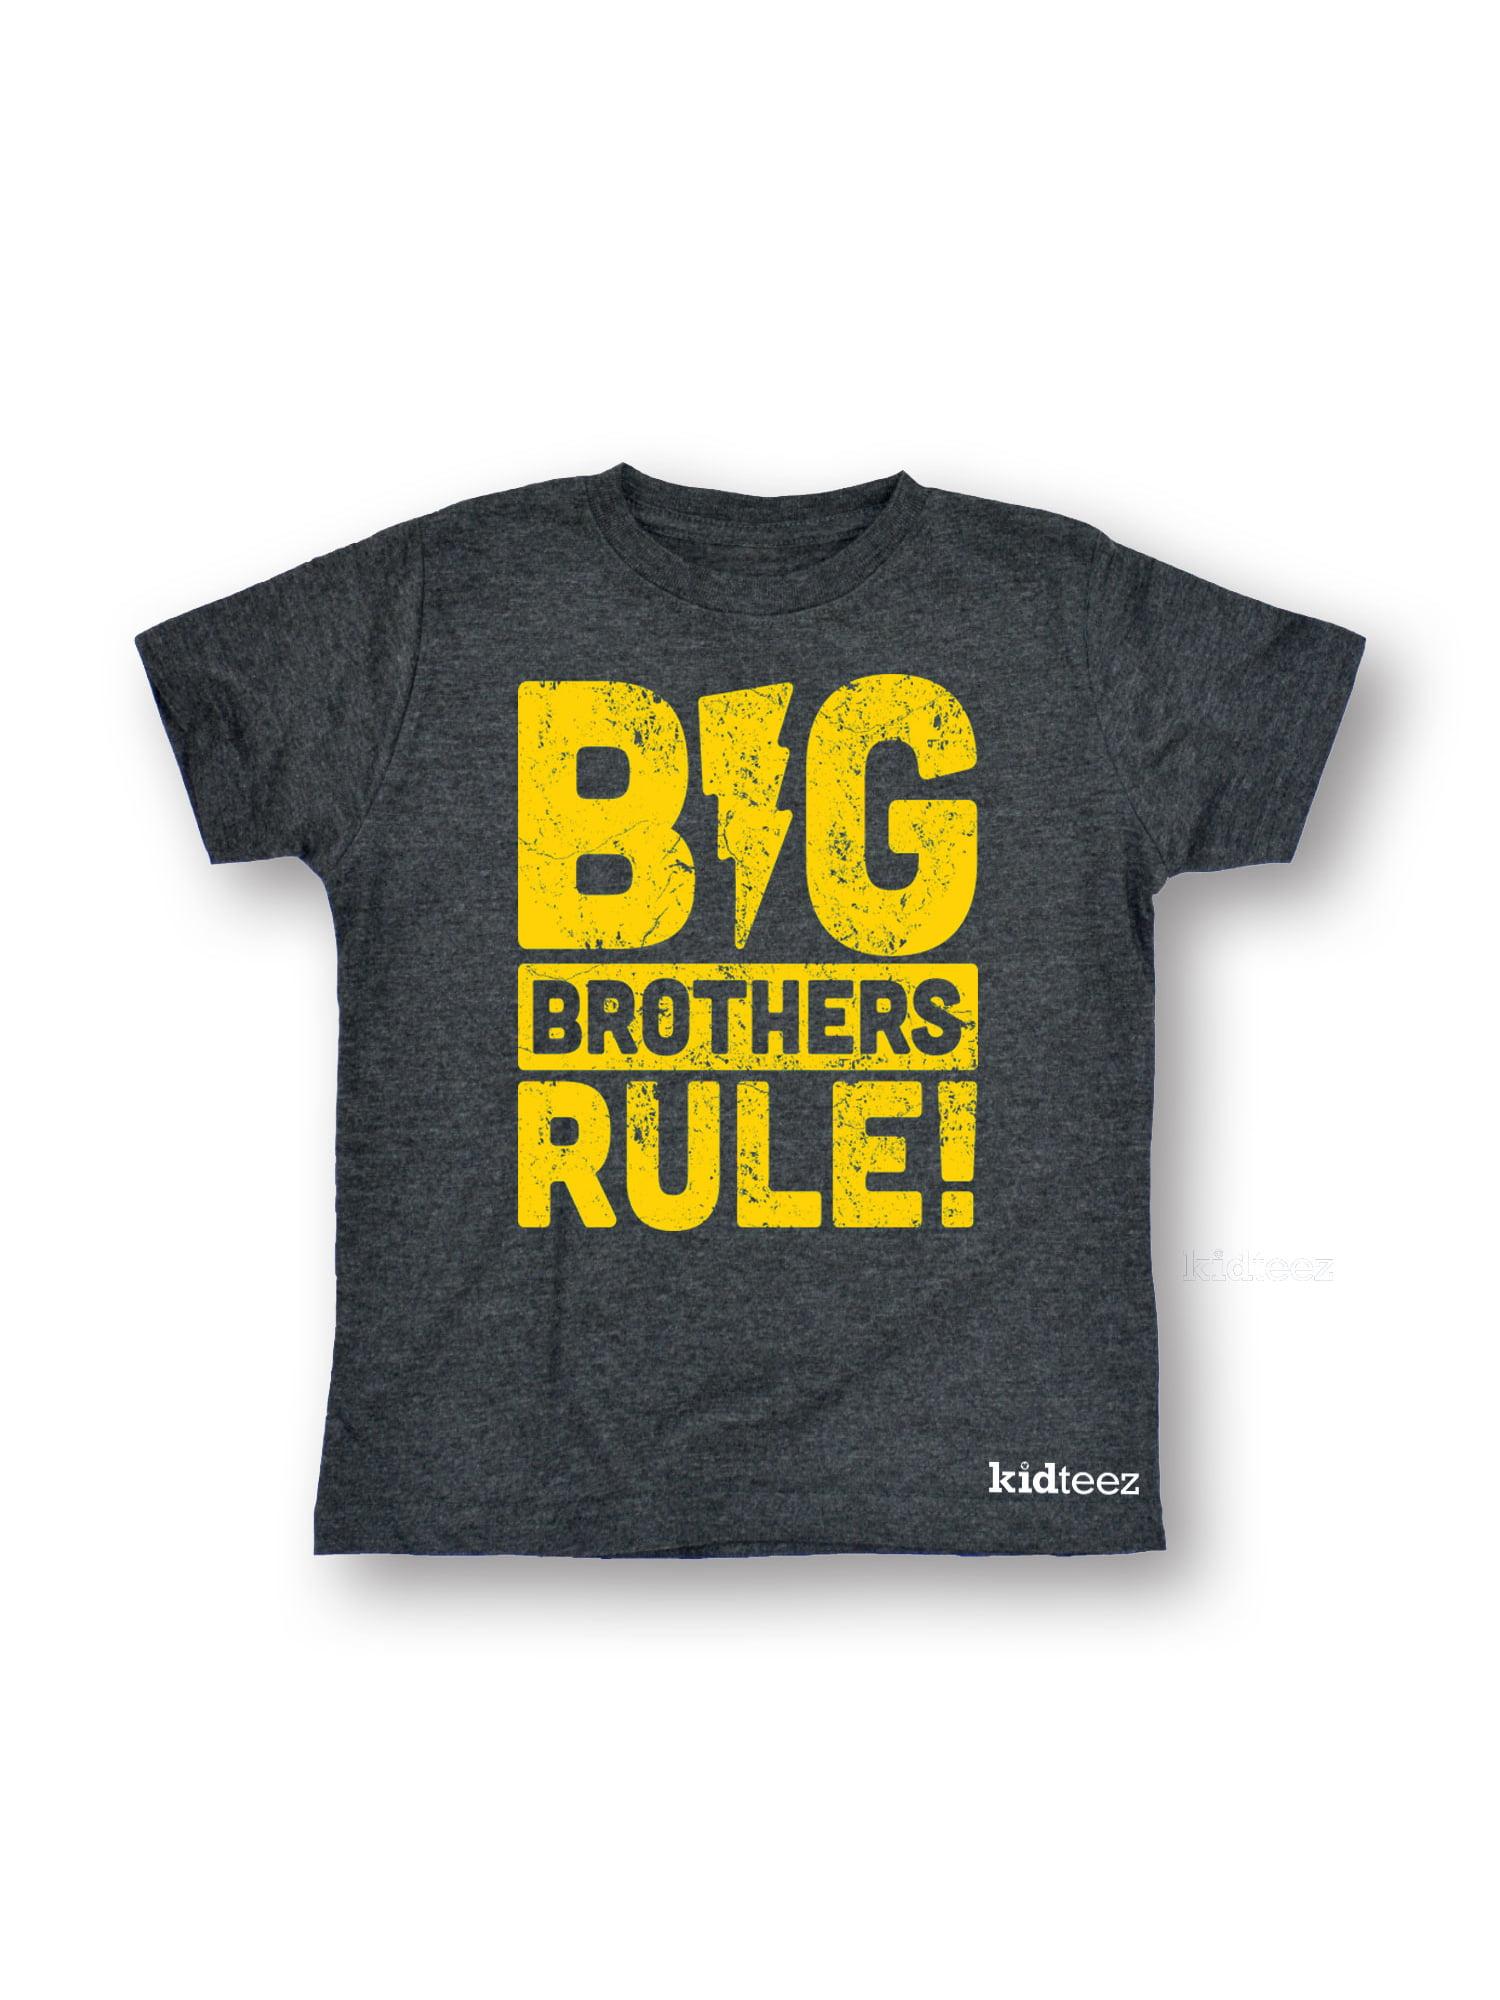 Big Brothers Rule-Toddler Short Sleeve Tee